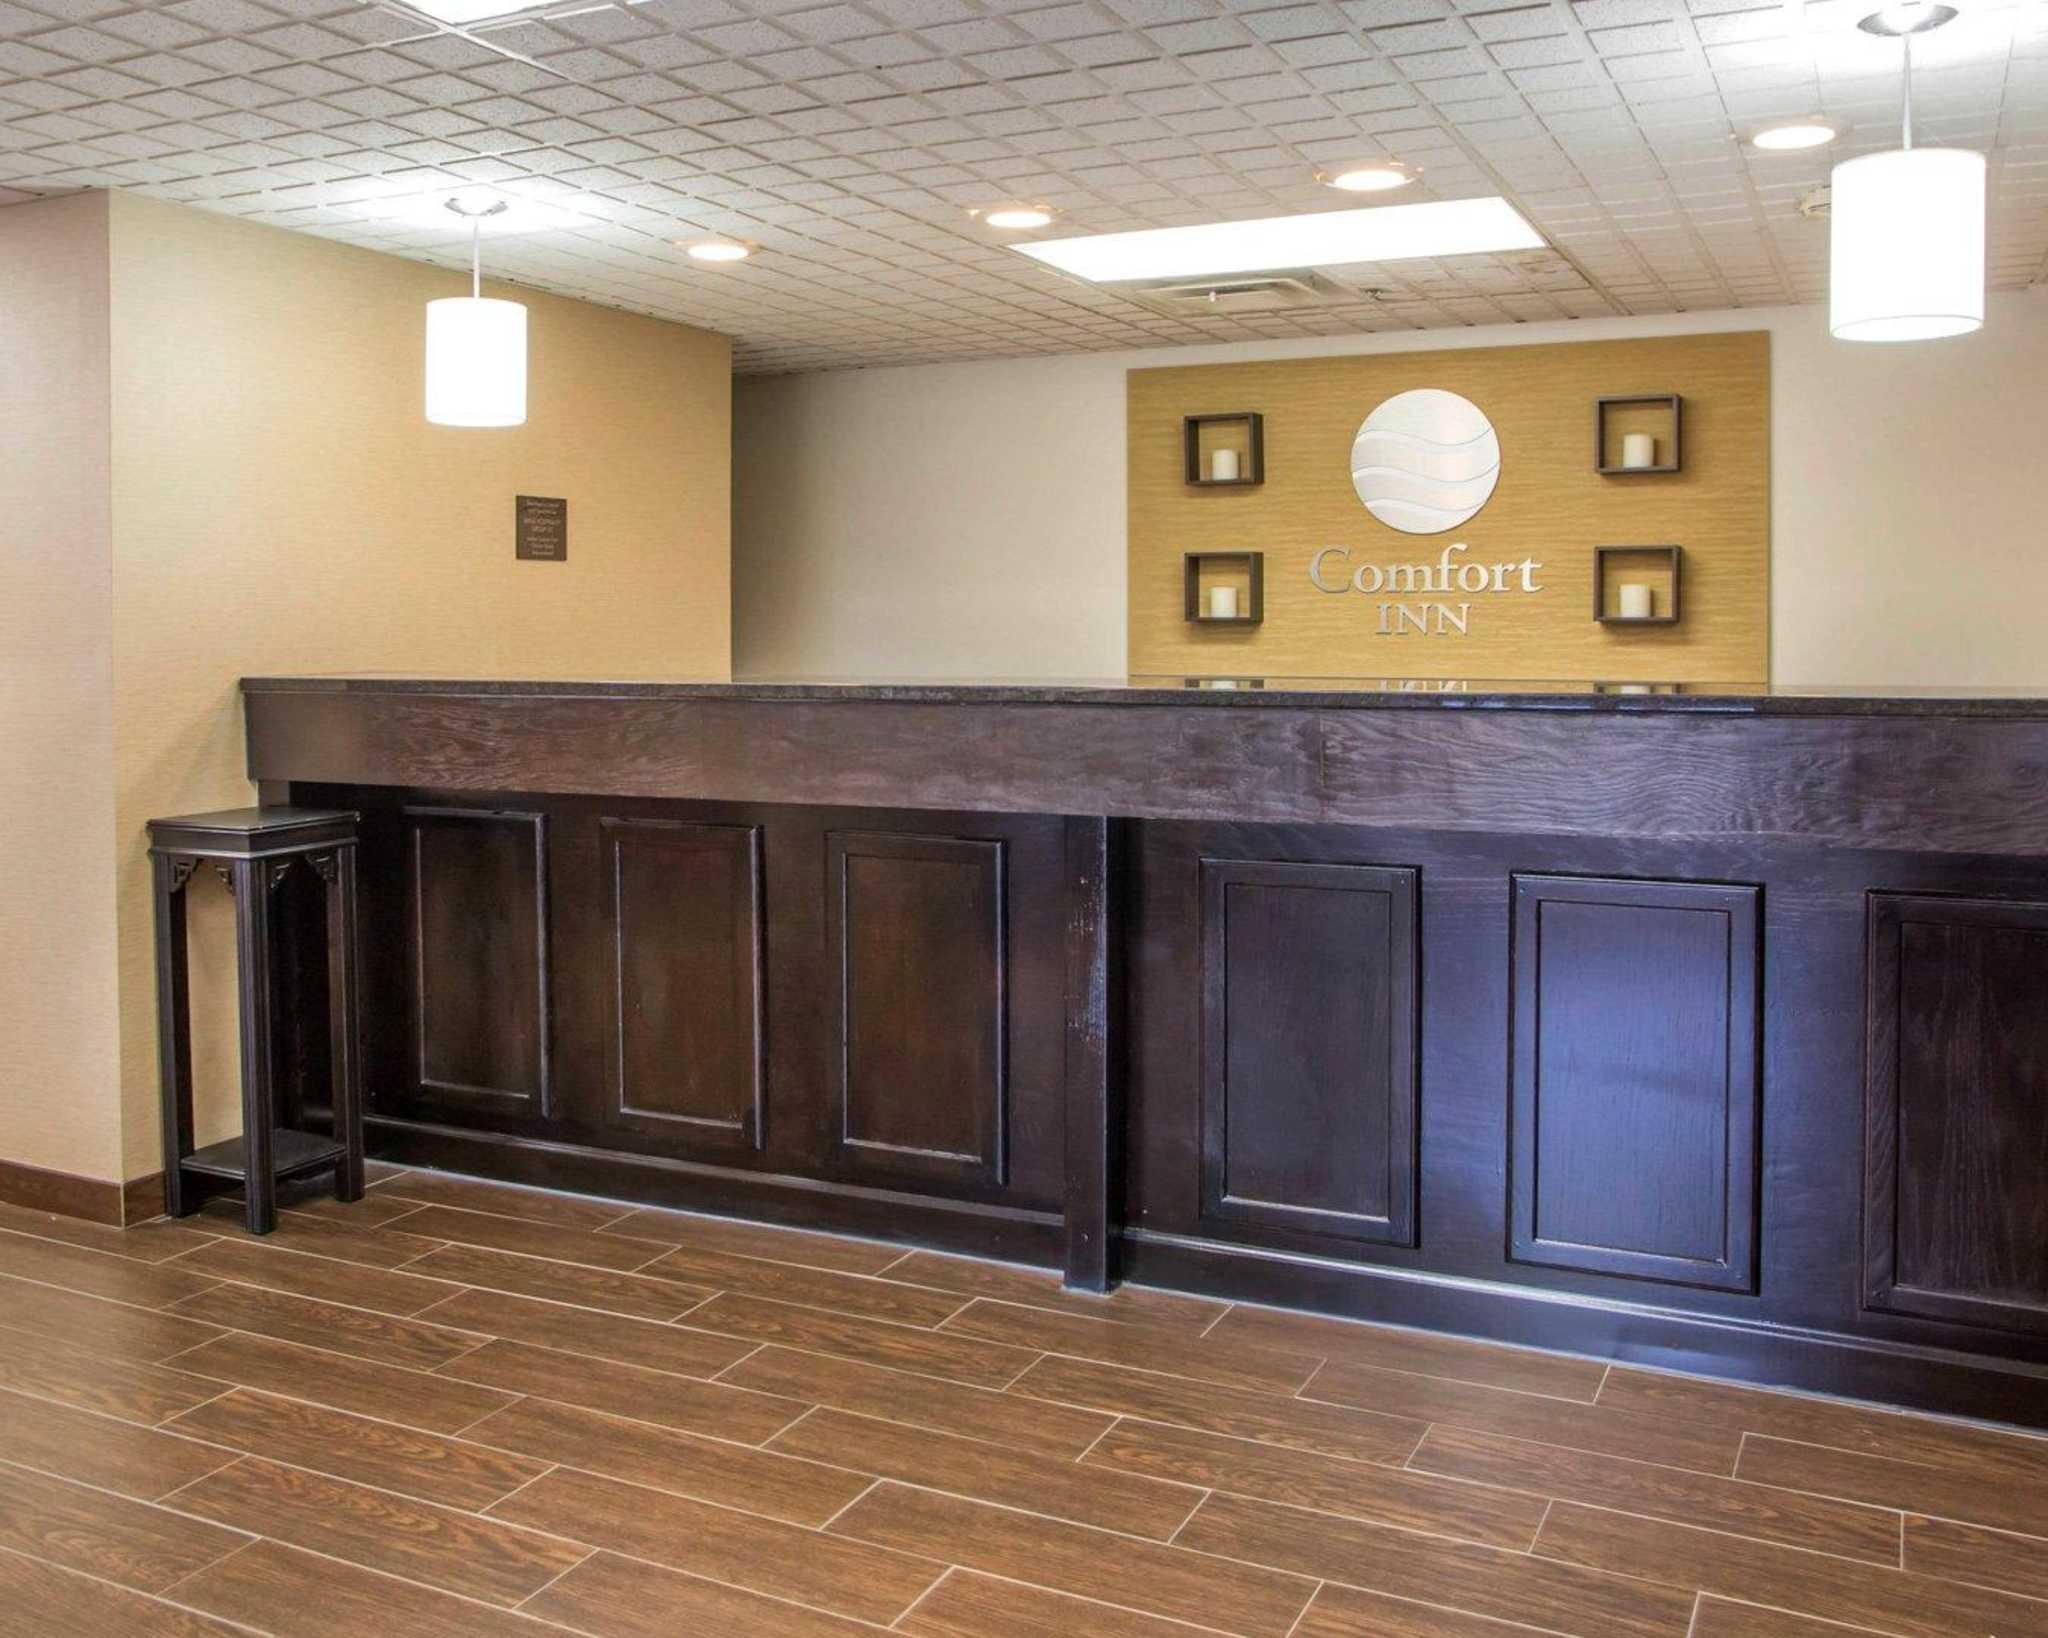 Comfort Inn Dayton - Huber Heights image 15